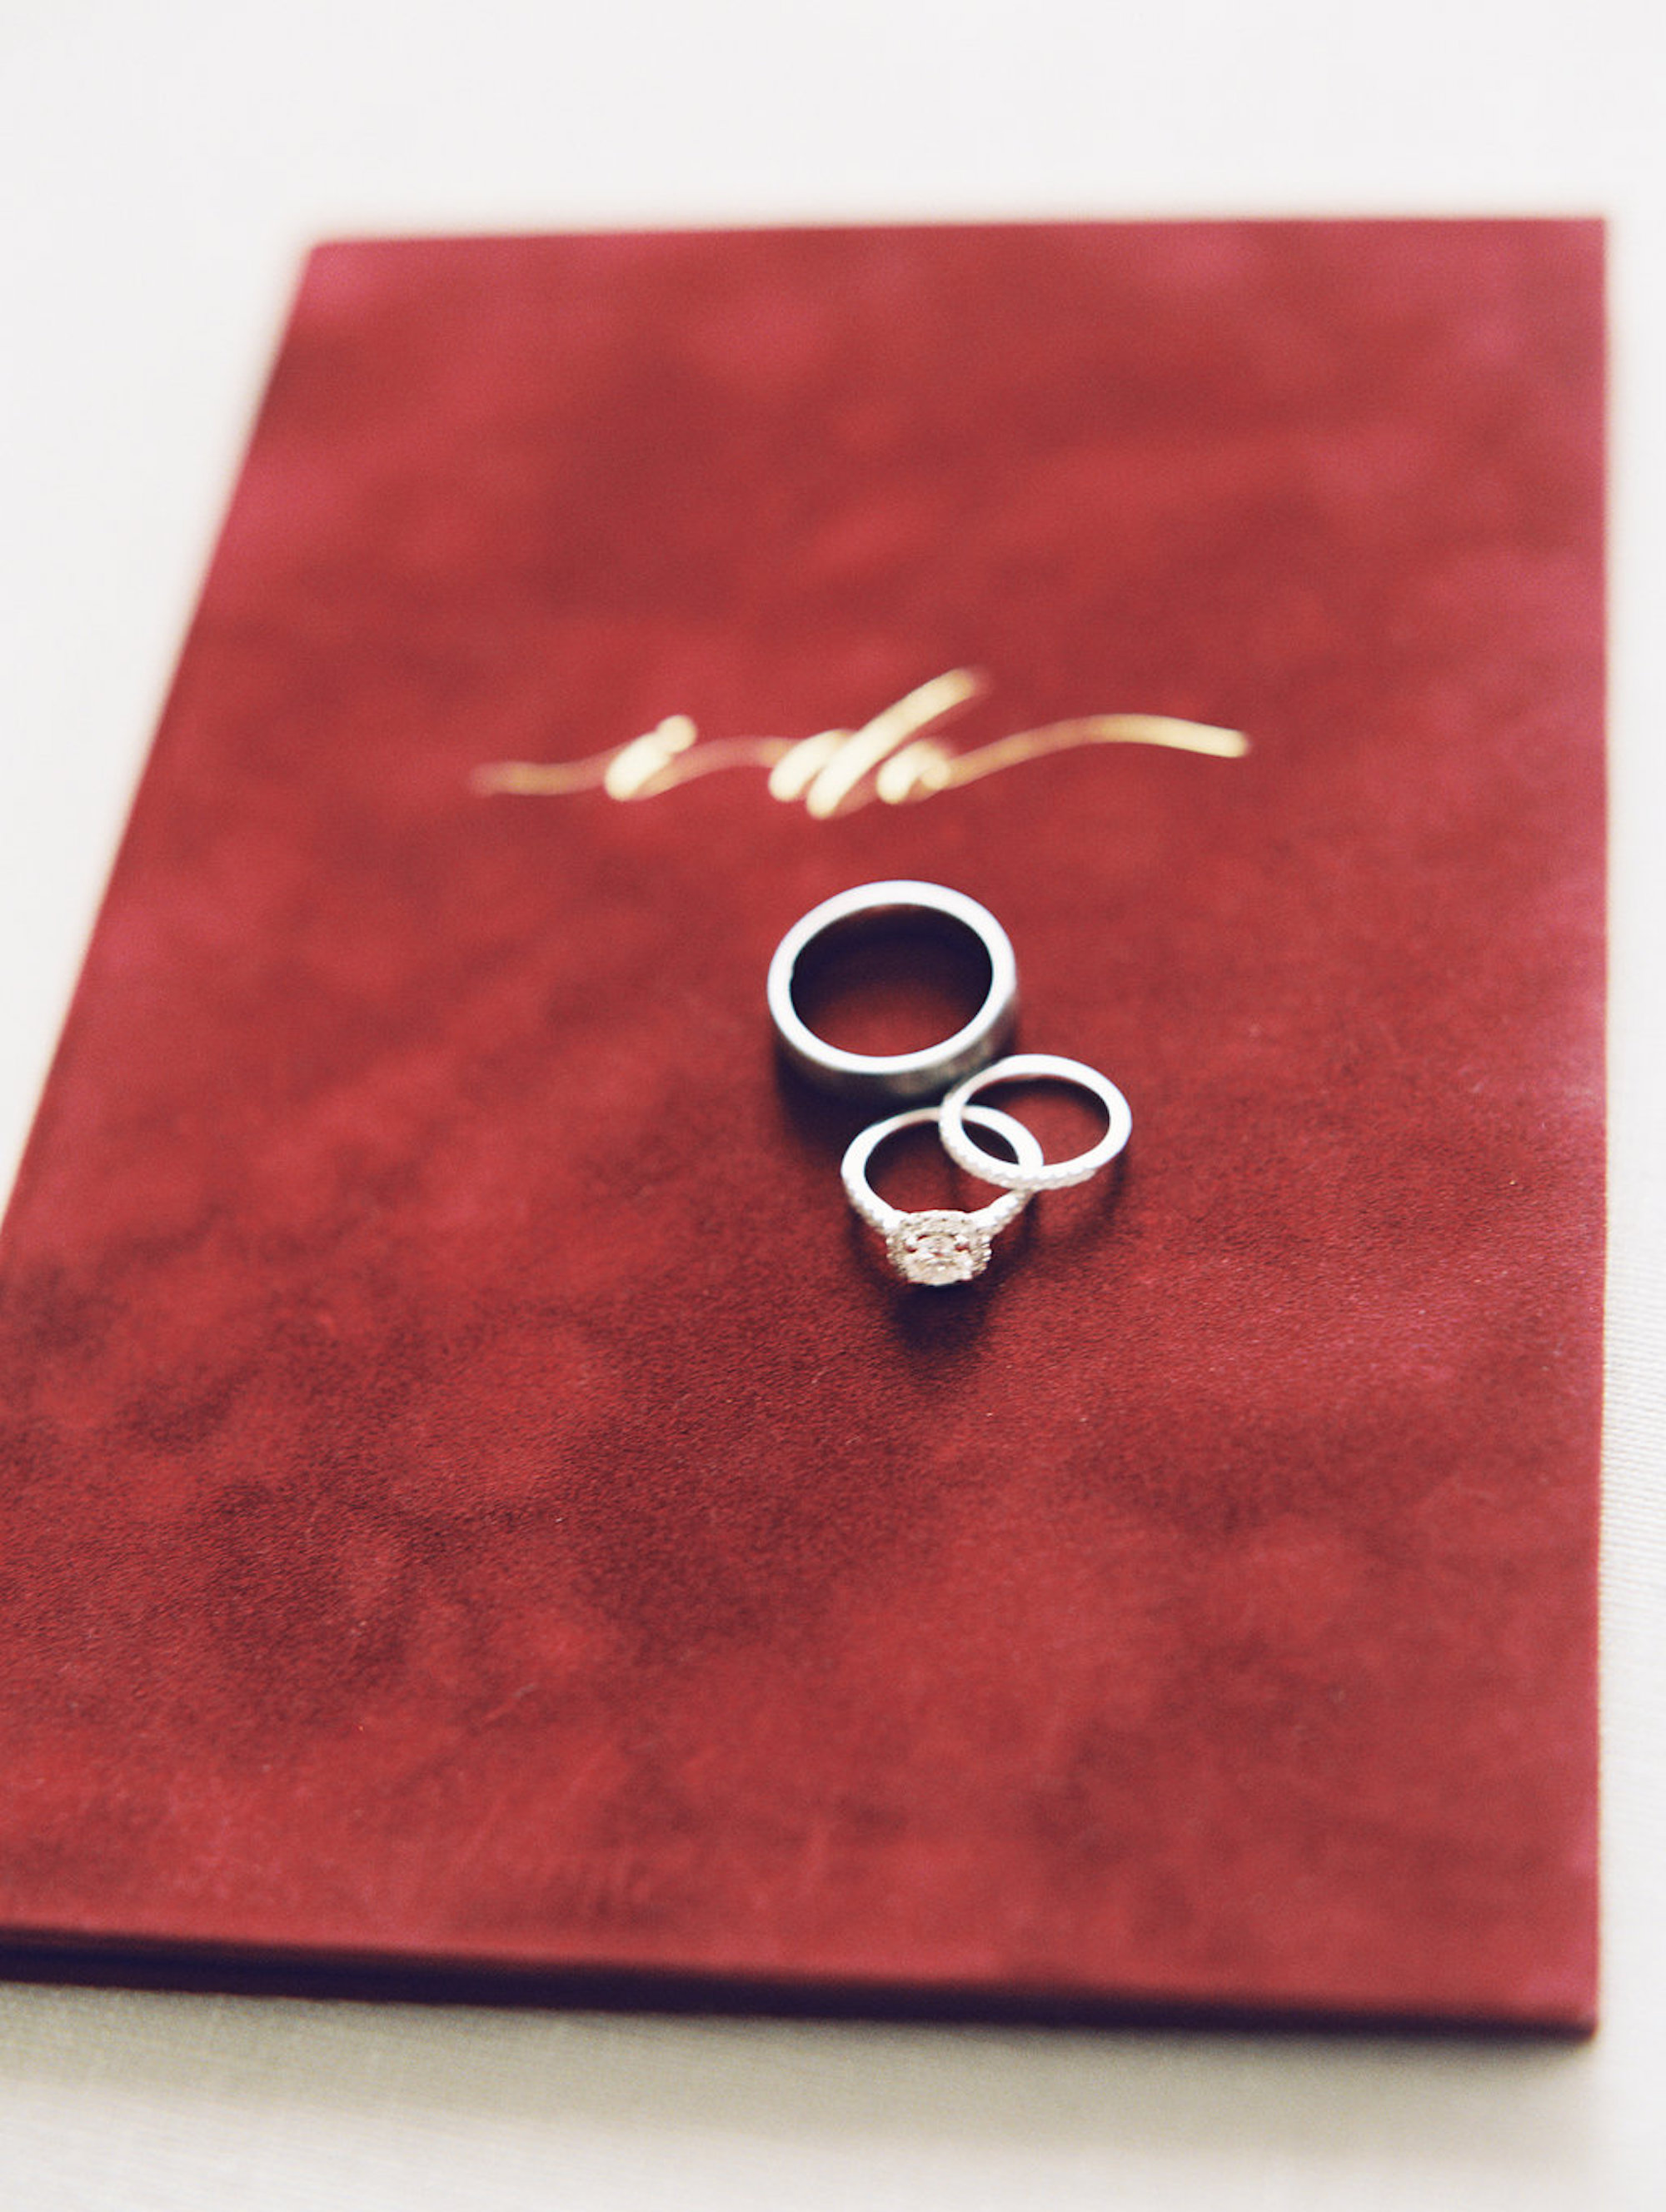 www.santabarbarawedding.com | Lavender & Twine | Michele B. Events | Santa Barbara Courthouse | Wedding Rings